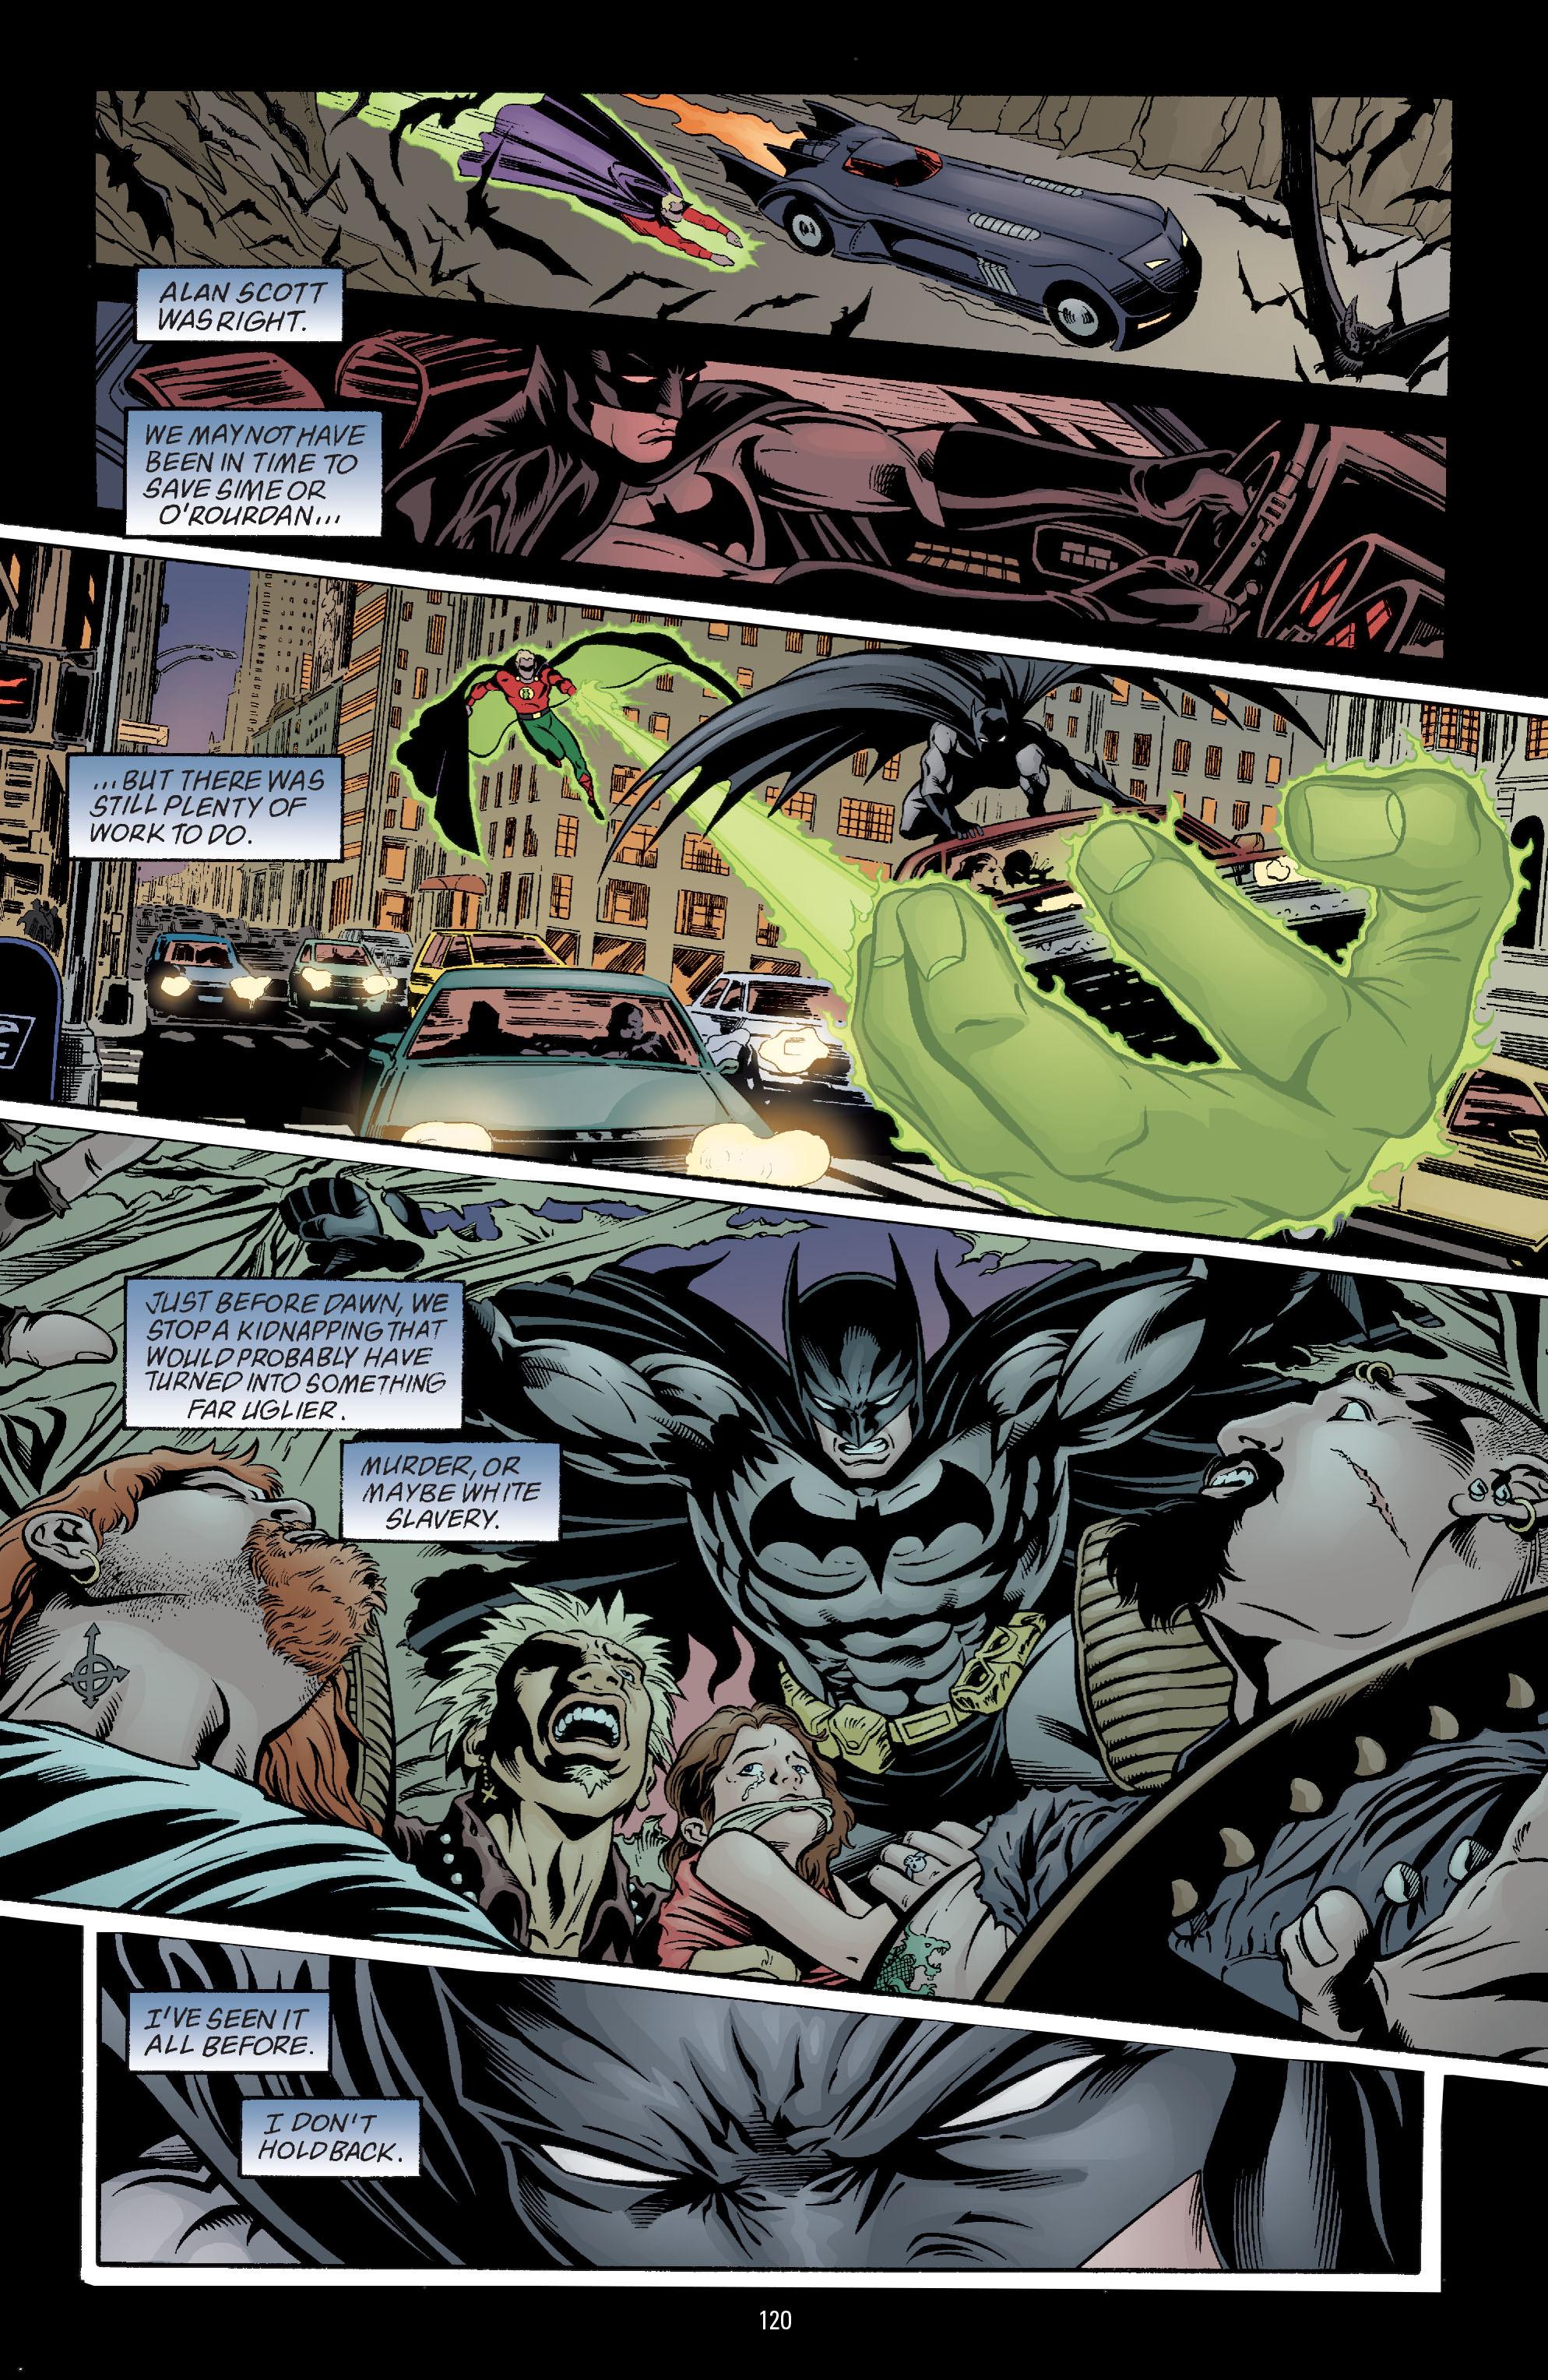 Batman: The Man Who Laughs chap 1 pic 121